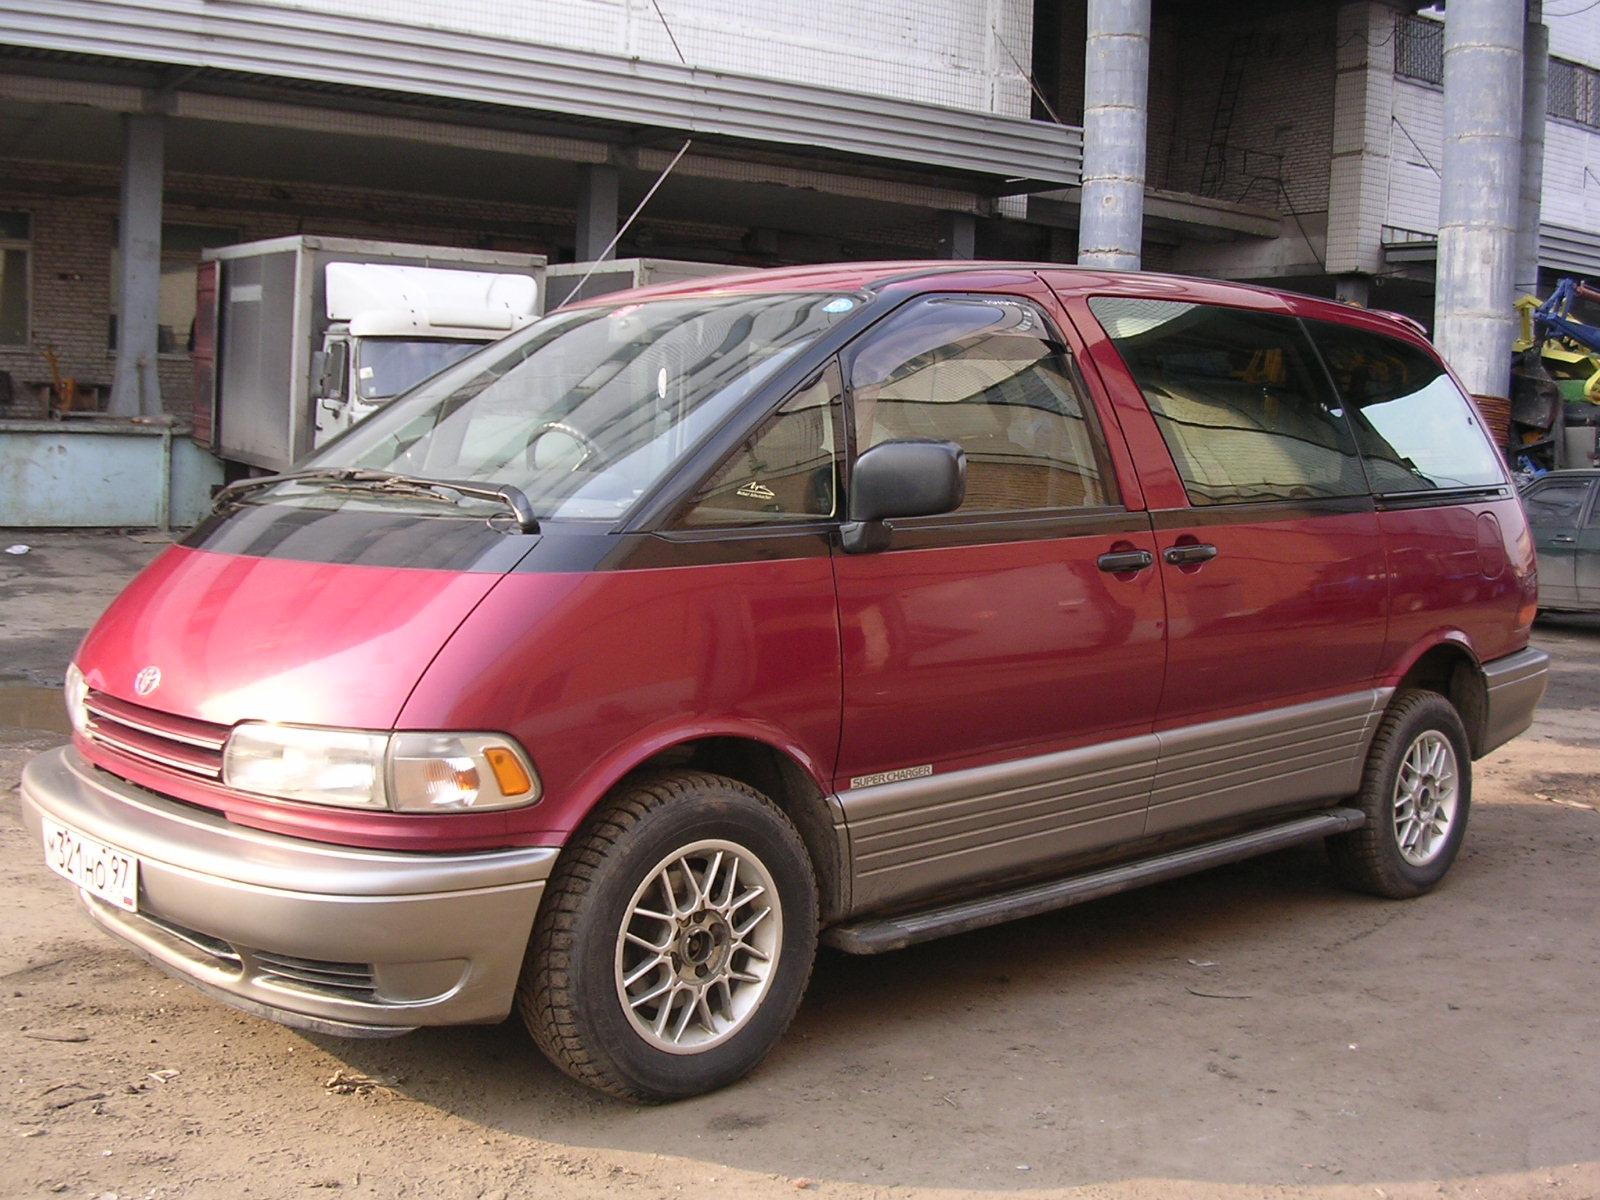 Toyota Estima Used Car For Sale